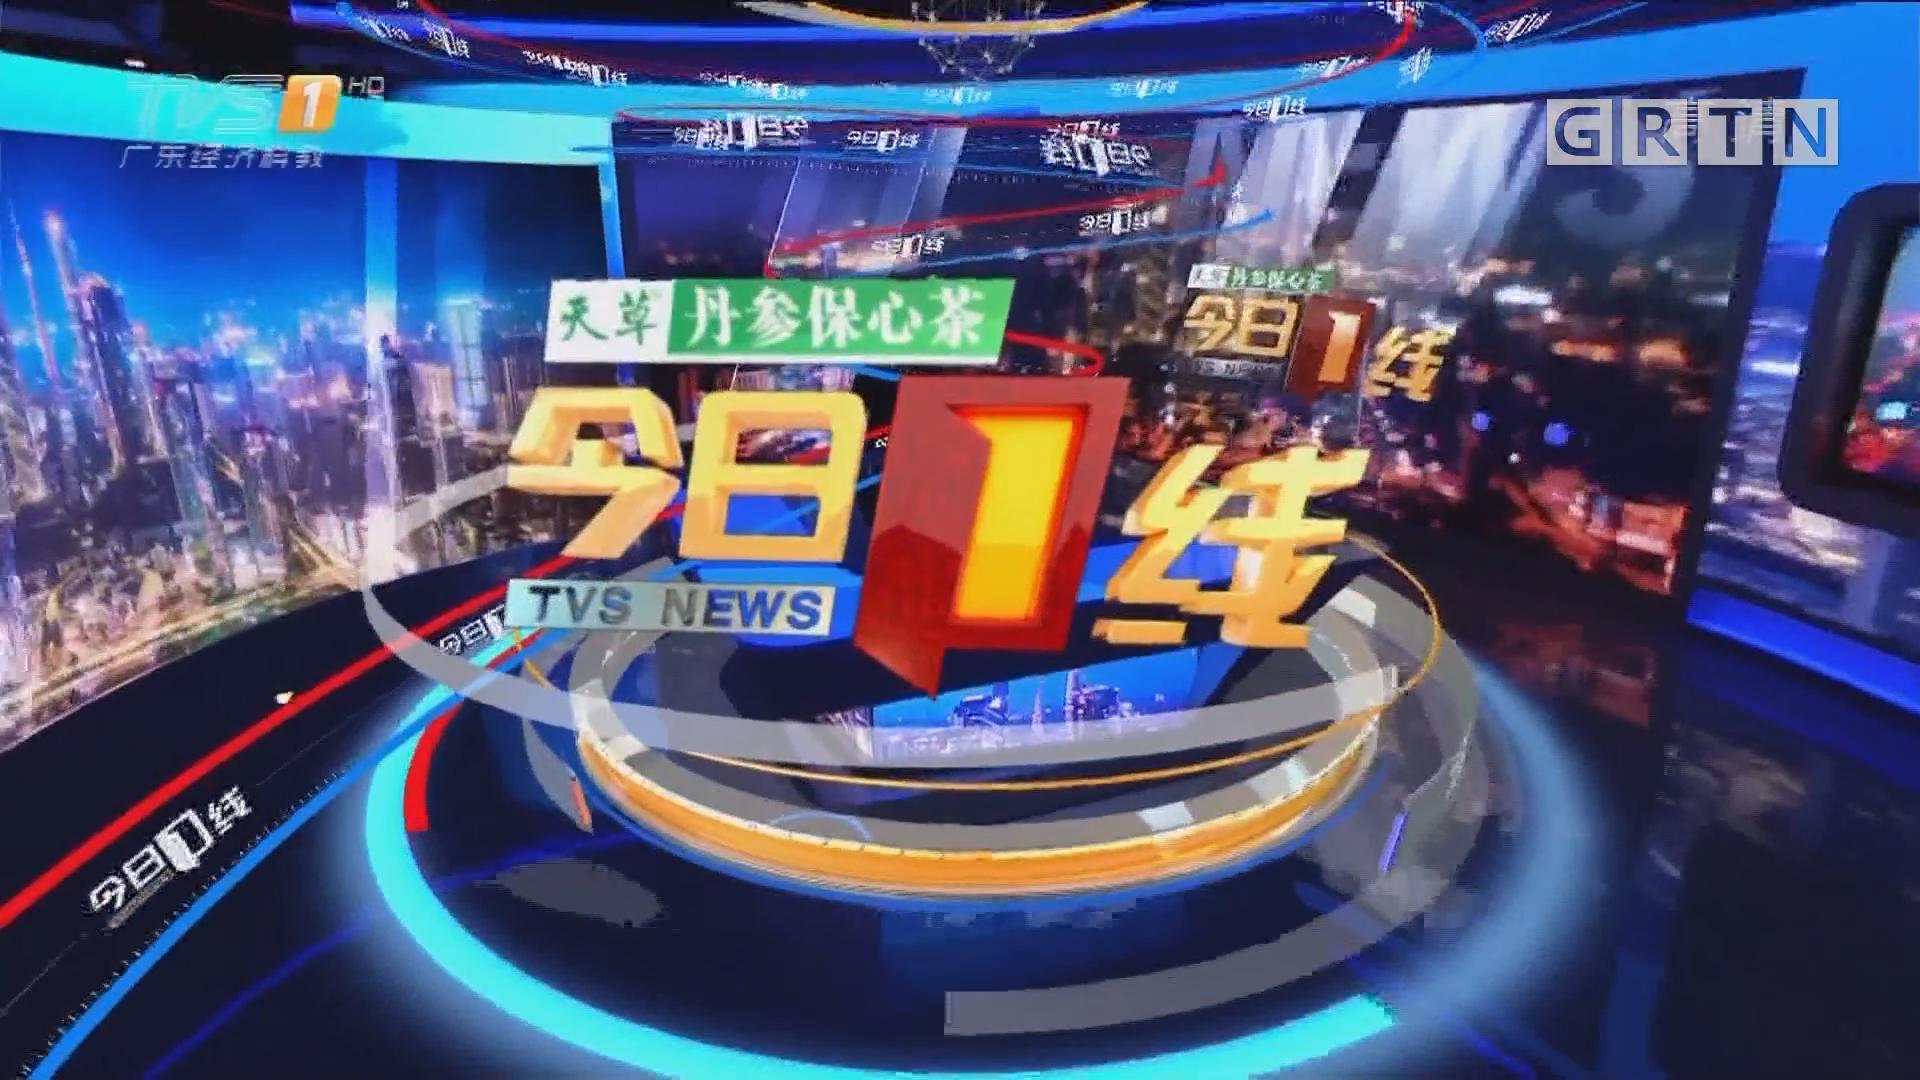 [HD][2019-02-25]今日一线:潮州:斑马线上致谢礼让车主 鞠躬女孩找到了